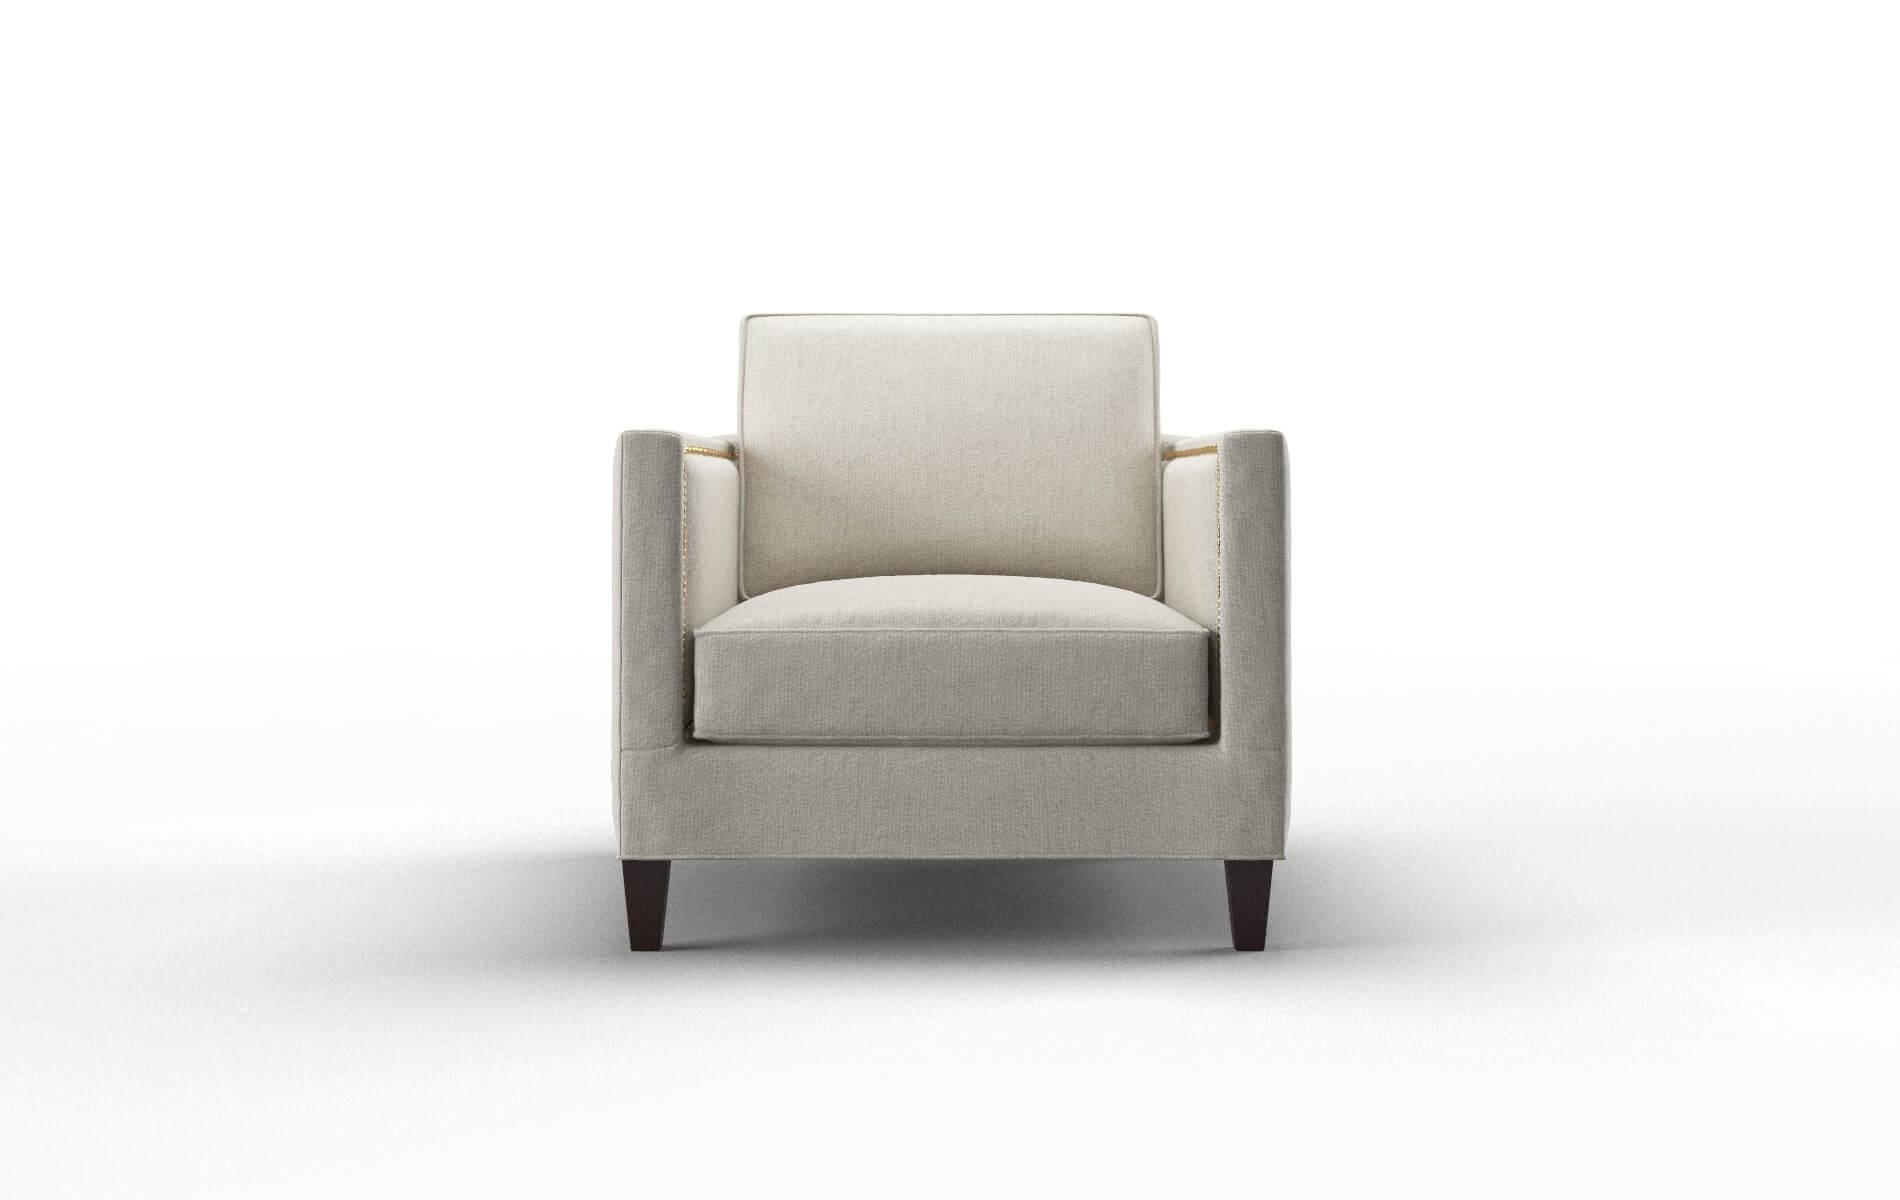 Alps Sasha Linen chair espresso legs